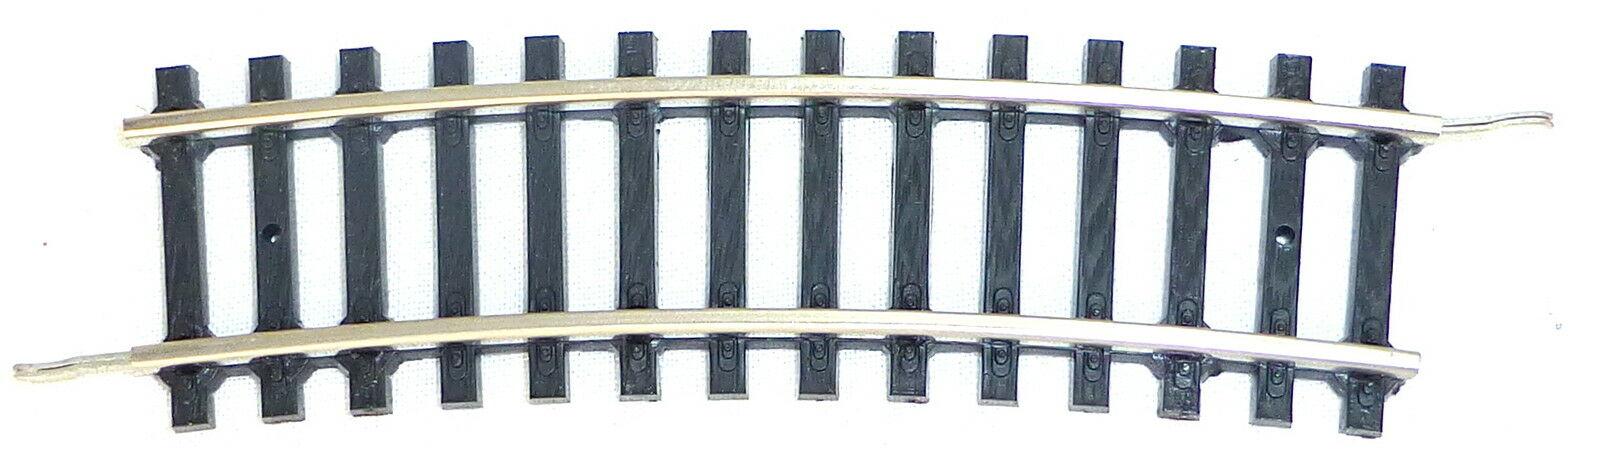 Kreuzung 15° Standardgleis Hohlprofil H0 Piko 6852 DDR Produktion GB2 å å